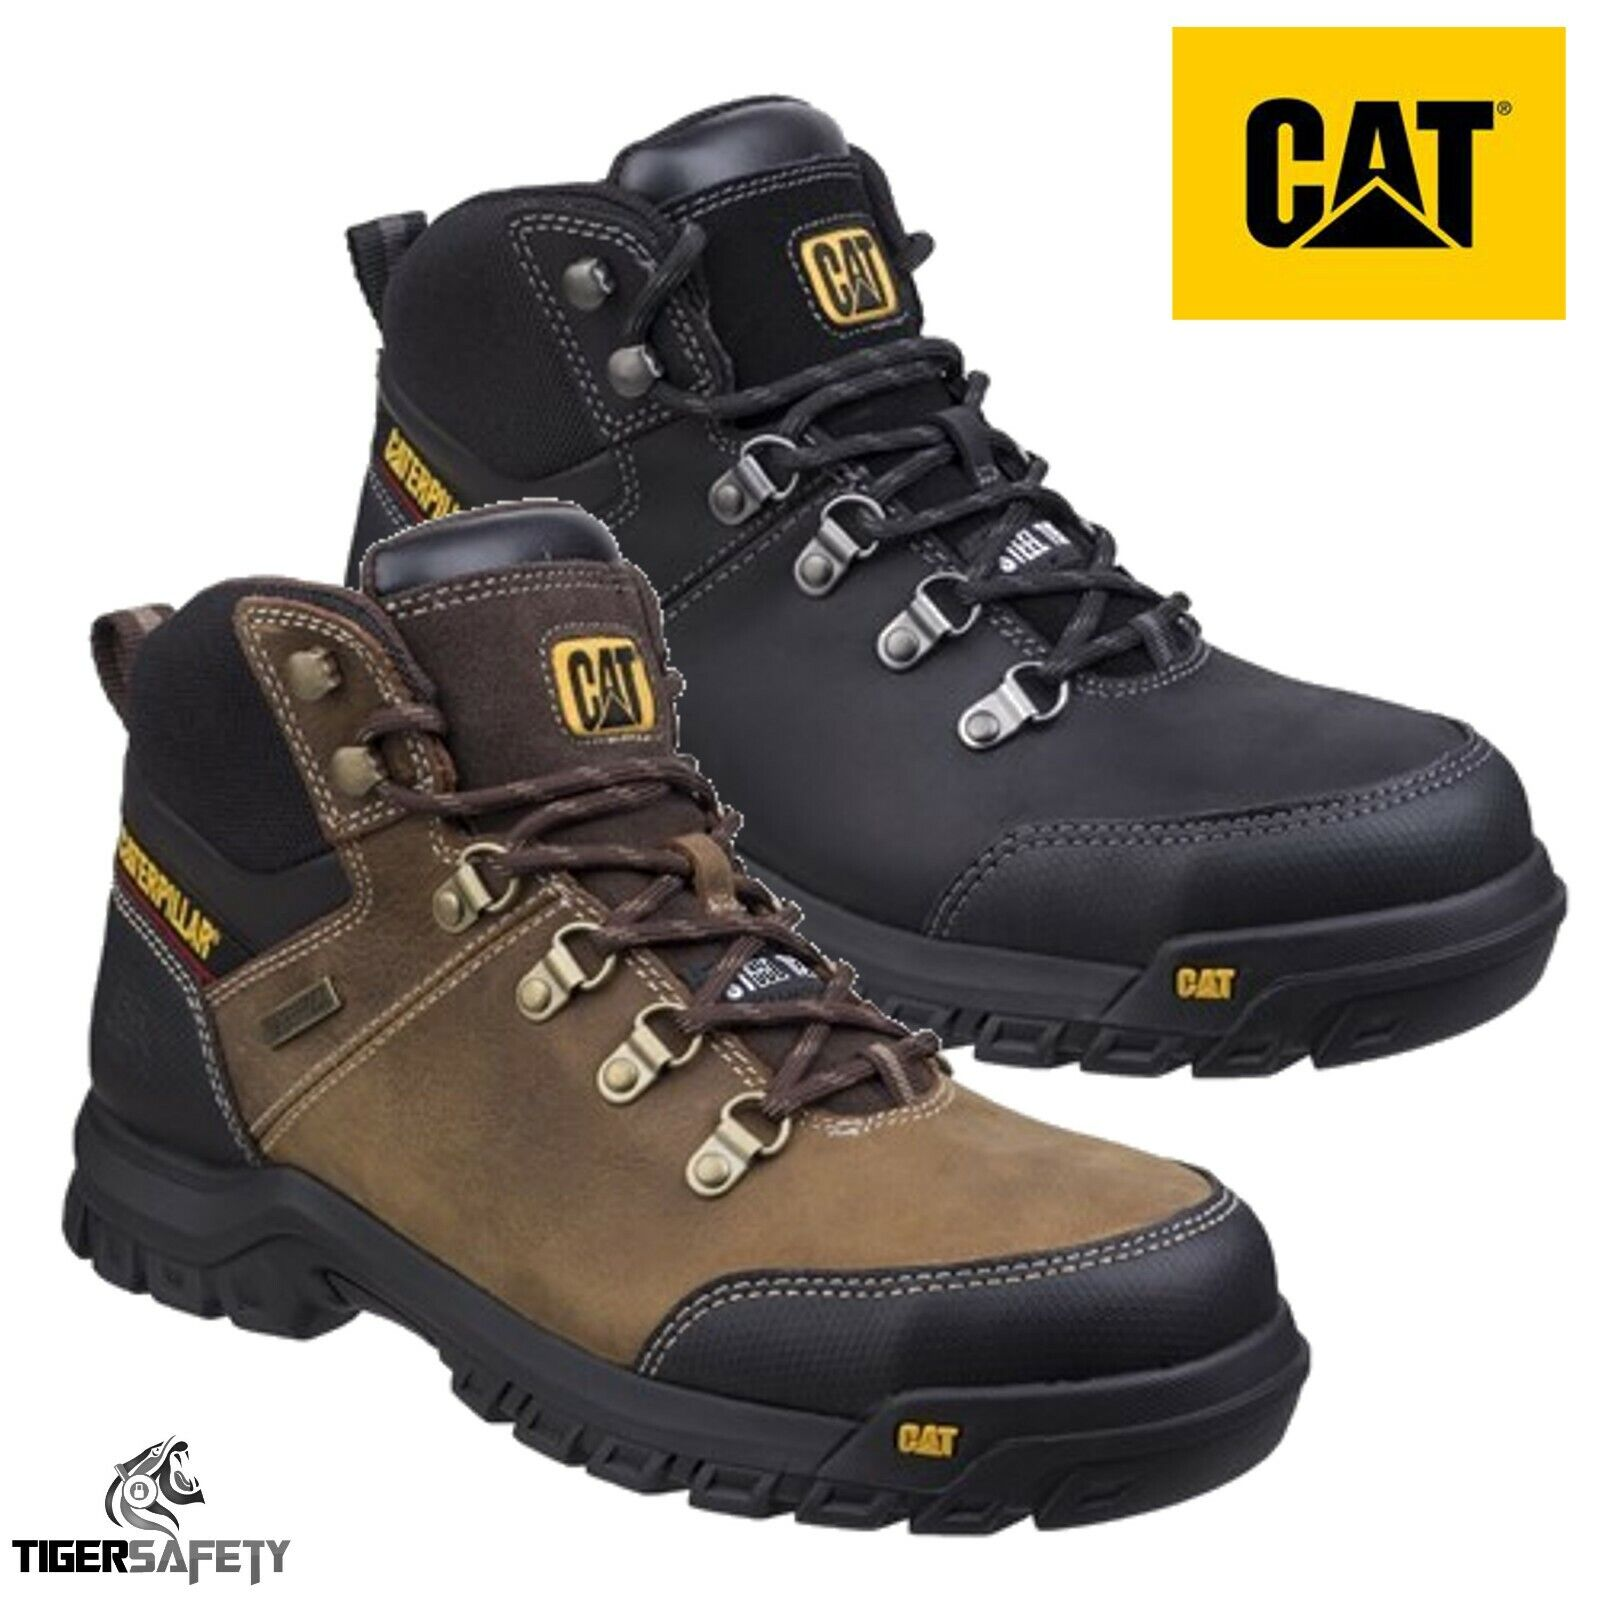 b7767d06e730 купить Caterpillar Mens Cat Footwear, с доставкой Caterpillar CAT Framework  S3 WR SRA Mens Waterproof